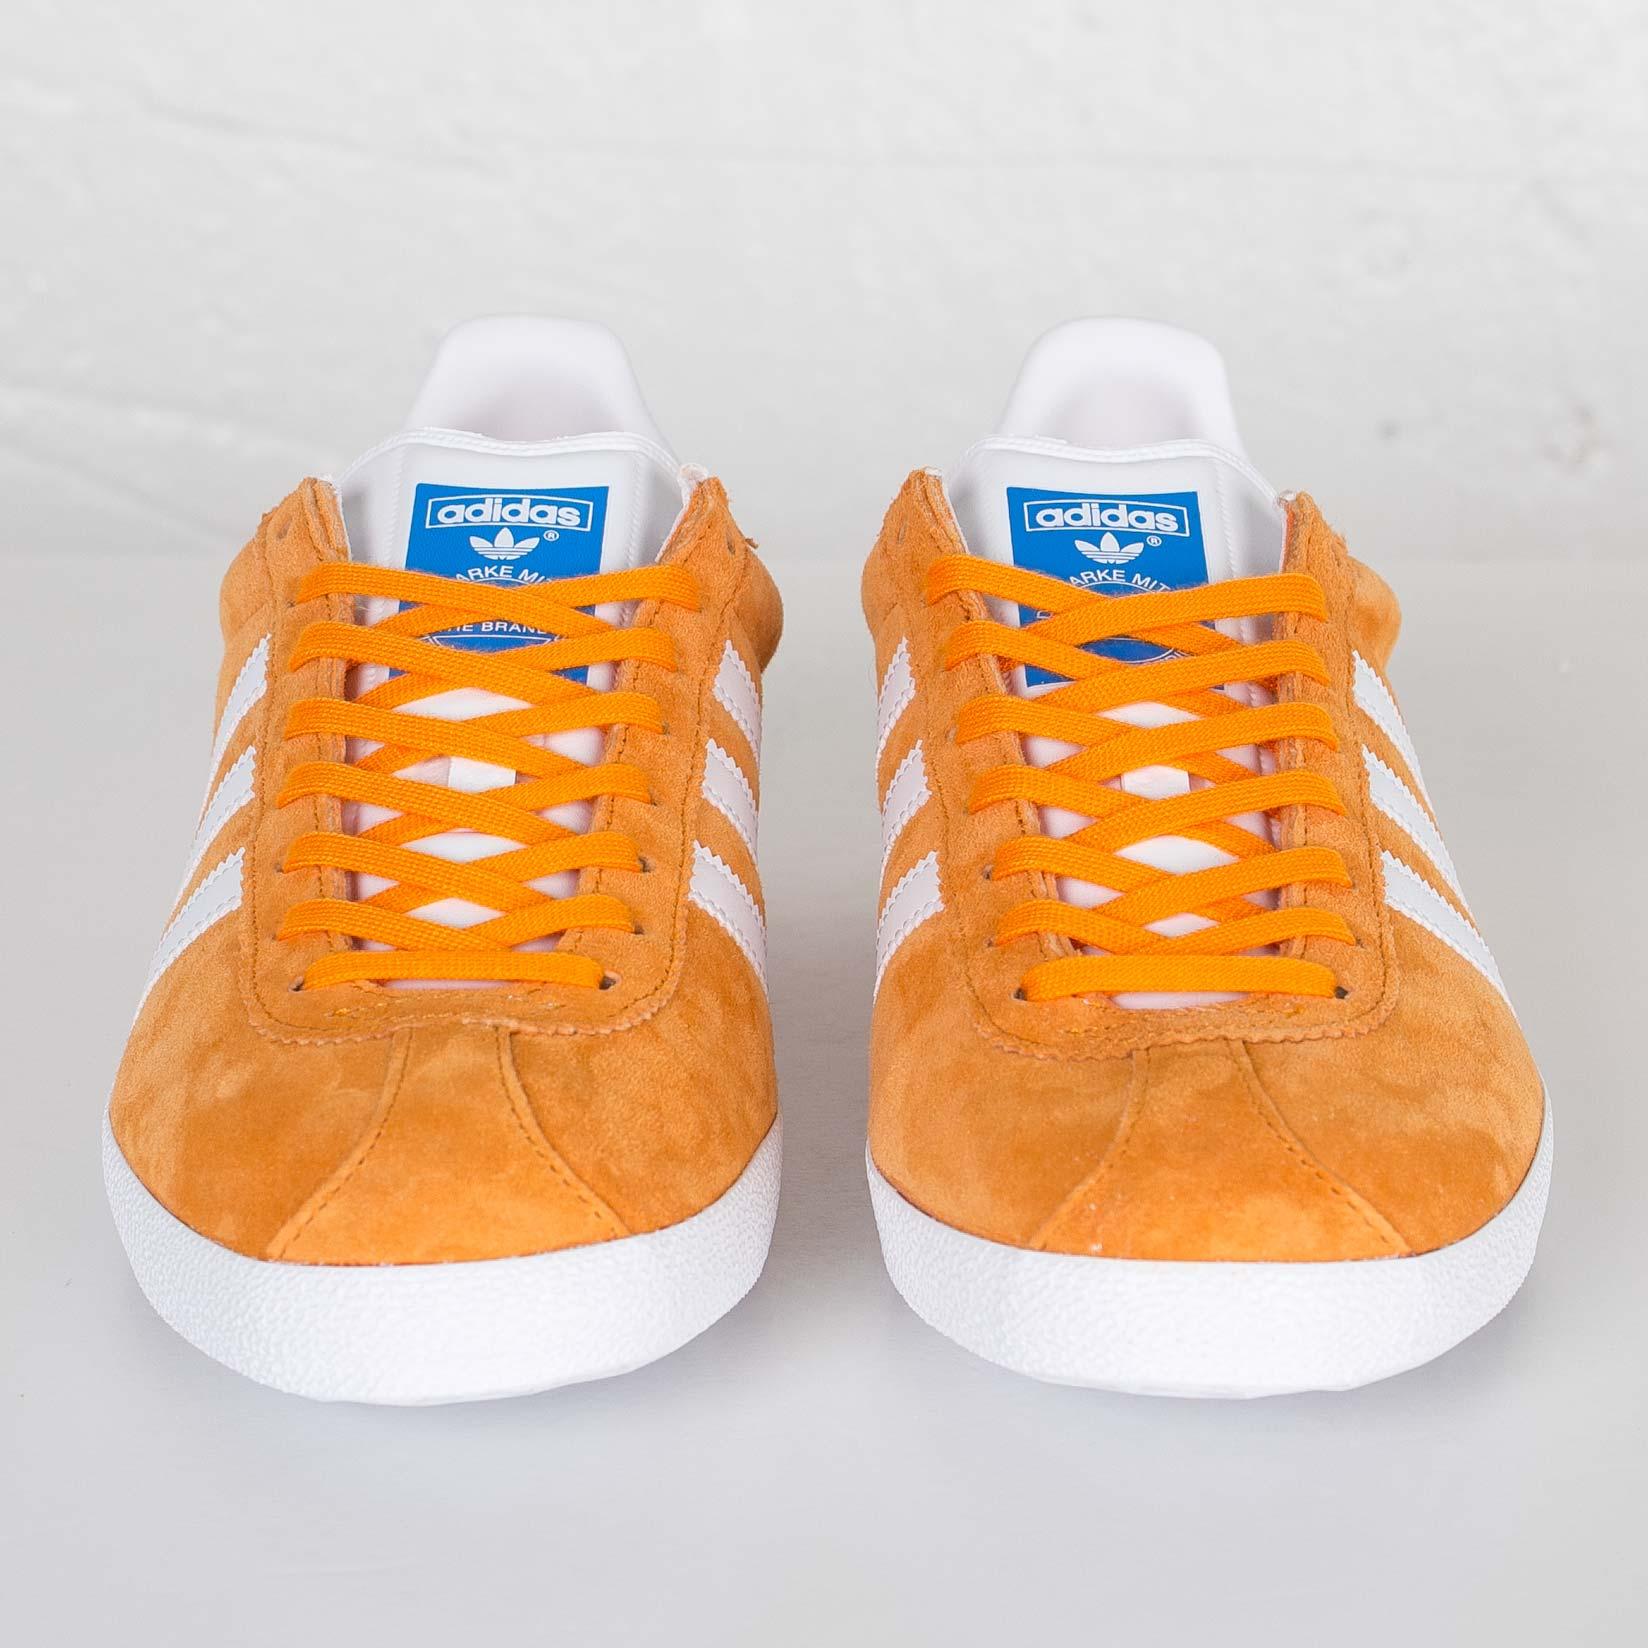 adidas Gazelle OG - S74848 - SNS | sneakers & streetwear online ...